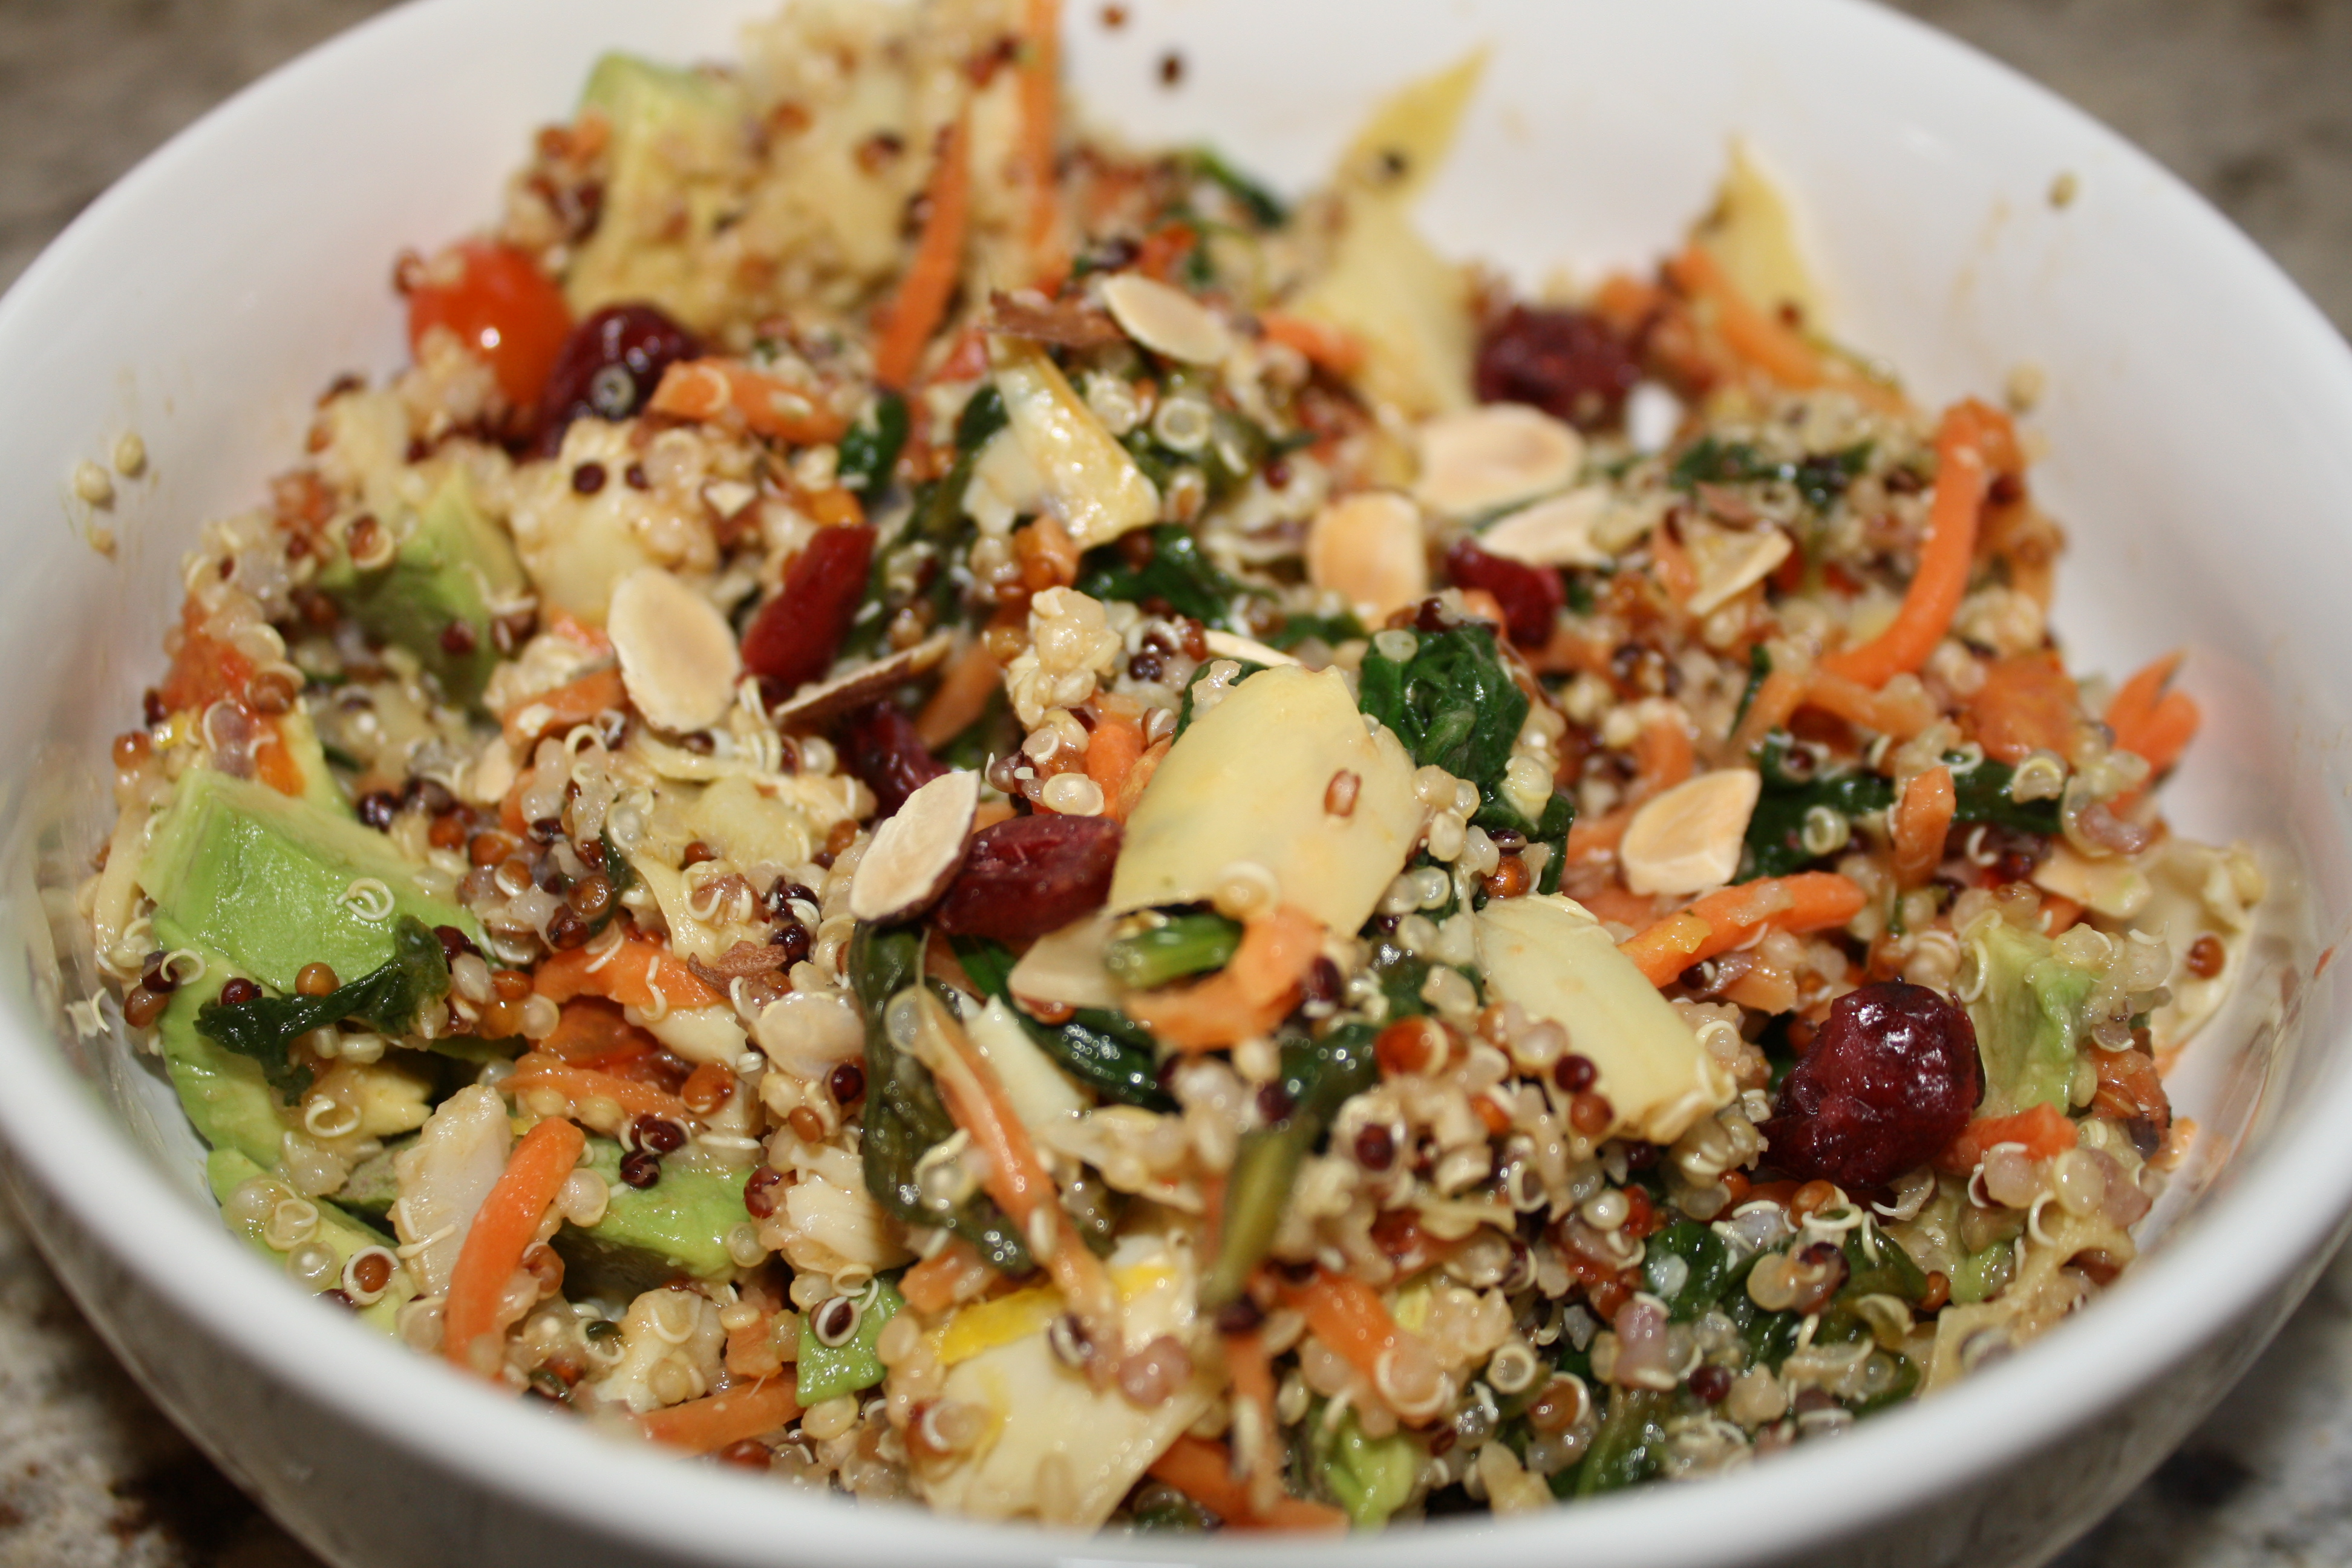 Tri Color Quinoa Salad with Veggies, Avocado, Cranberries and Almonds